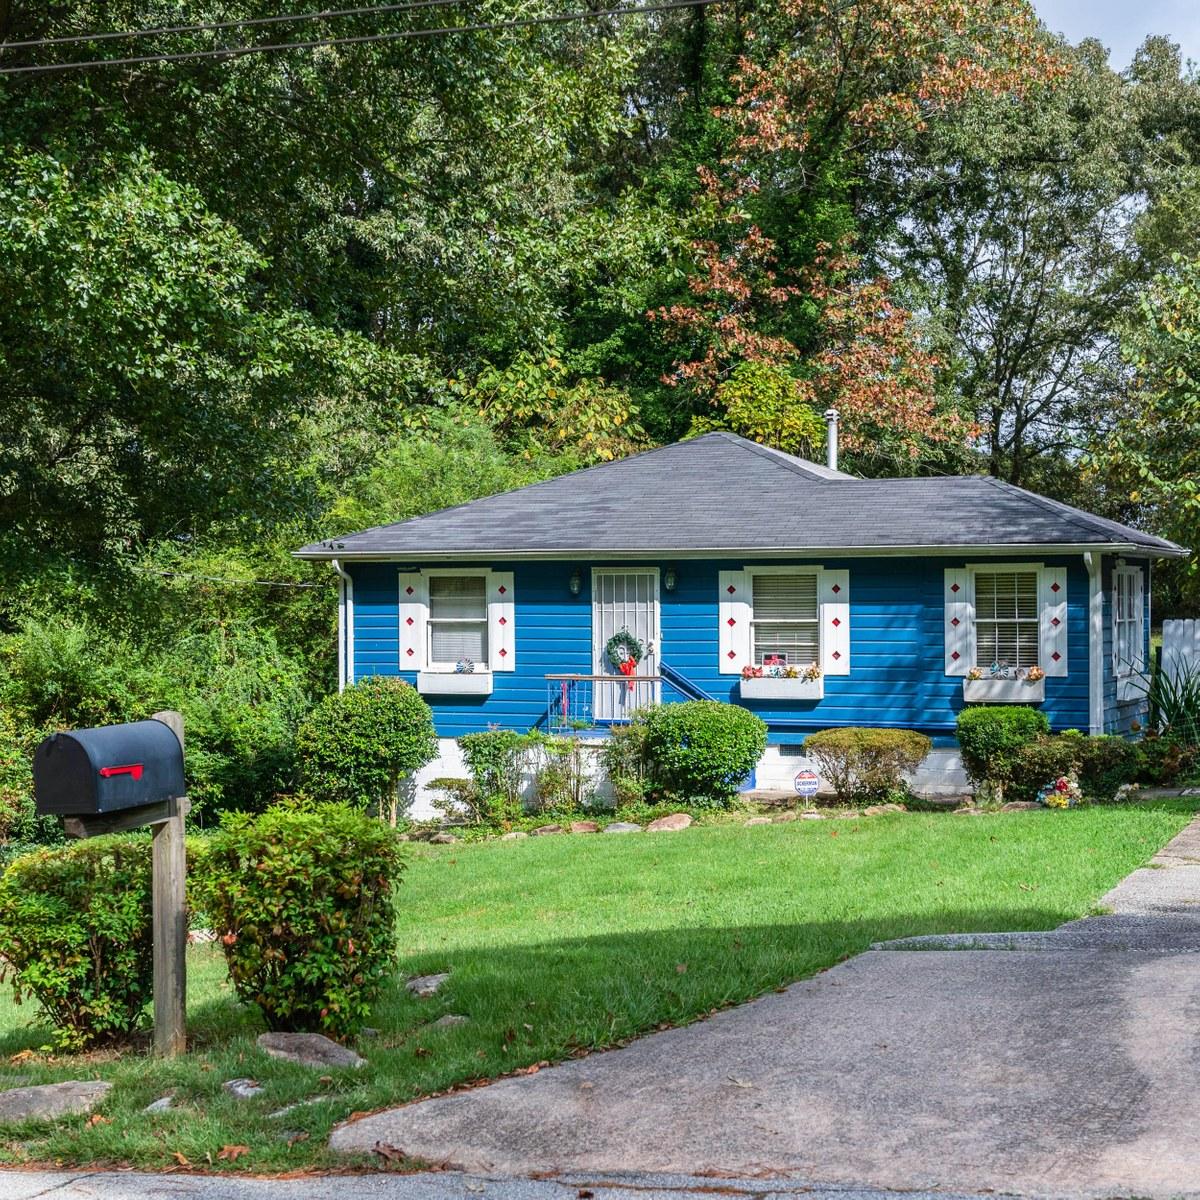 Local Com Homes For Rent: Collier Heights, Atlanta GA - Neighborhood Guide